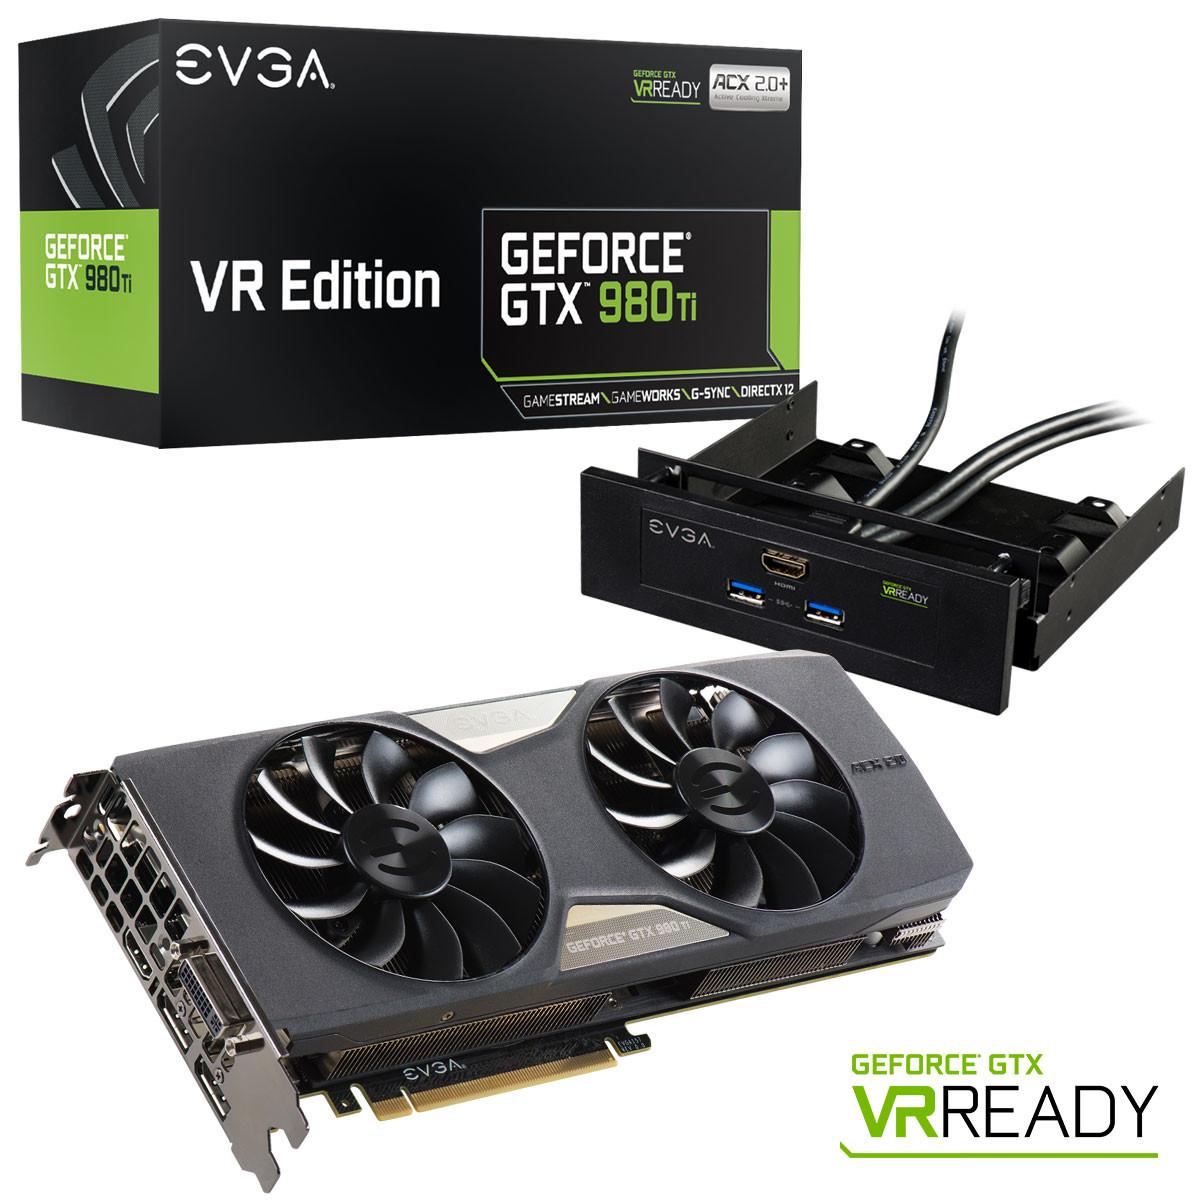 EVGA GeForce GTX 980 Ti ACX SC+ ACX 2.0+ Graphics Card